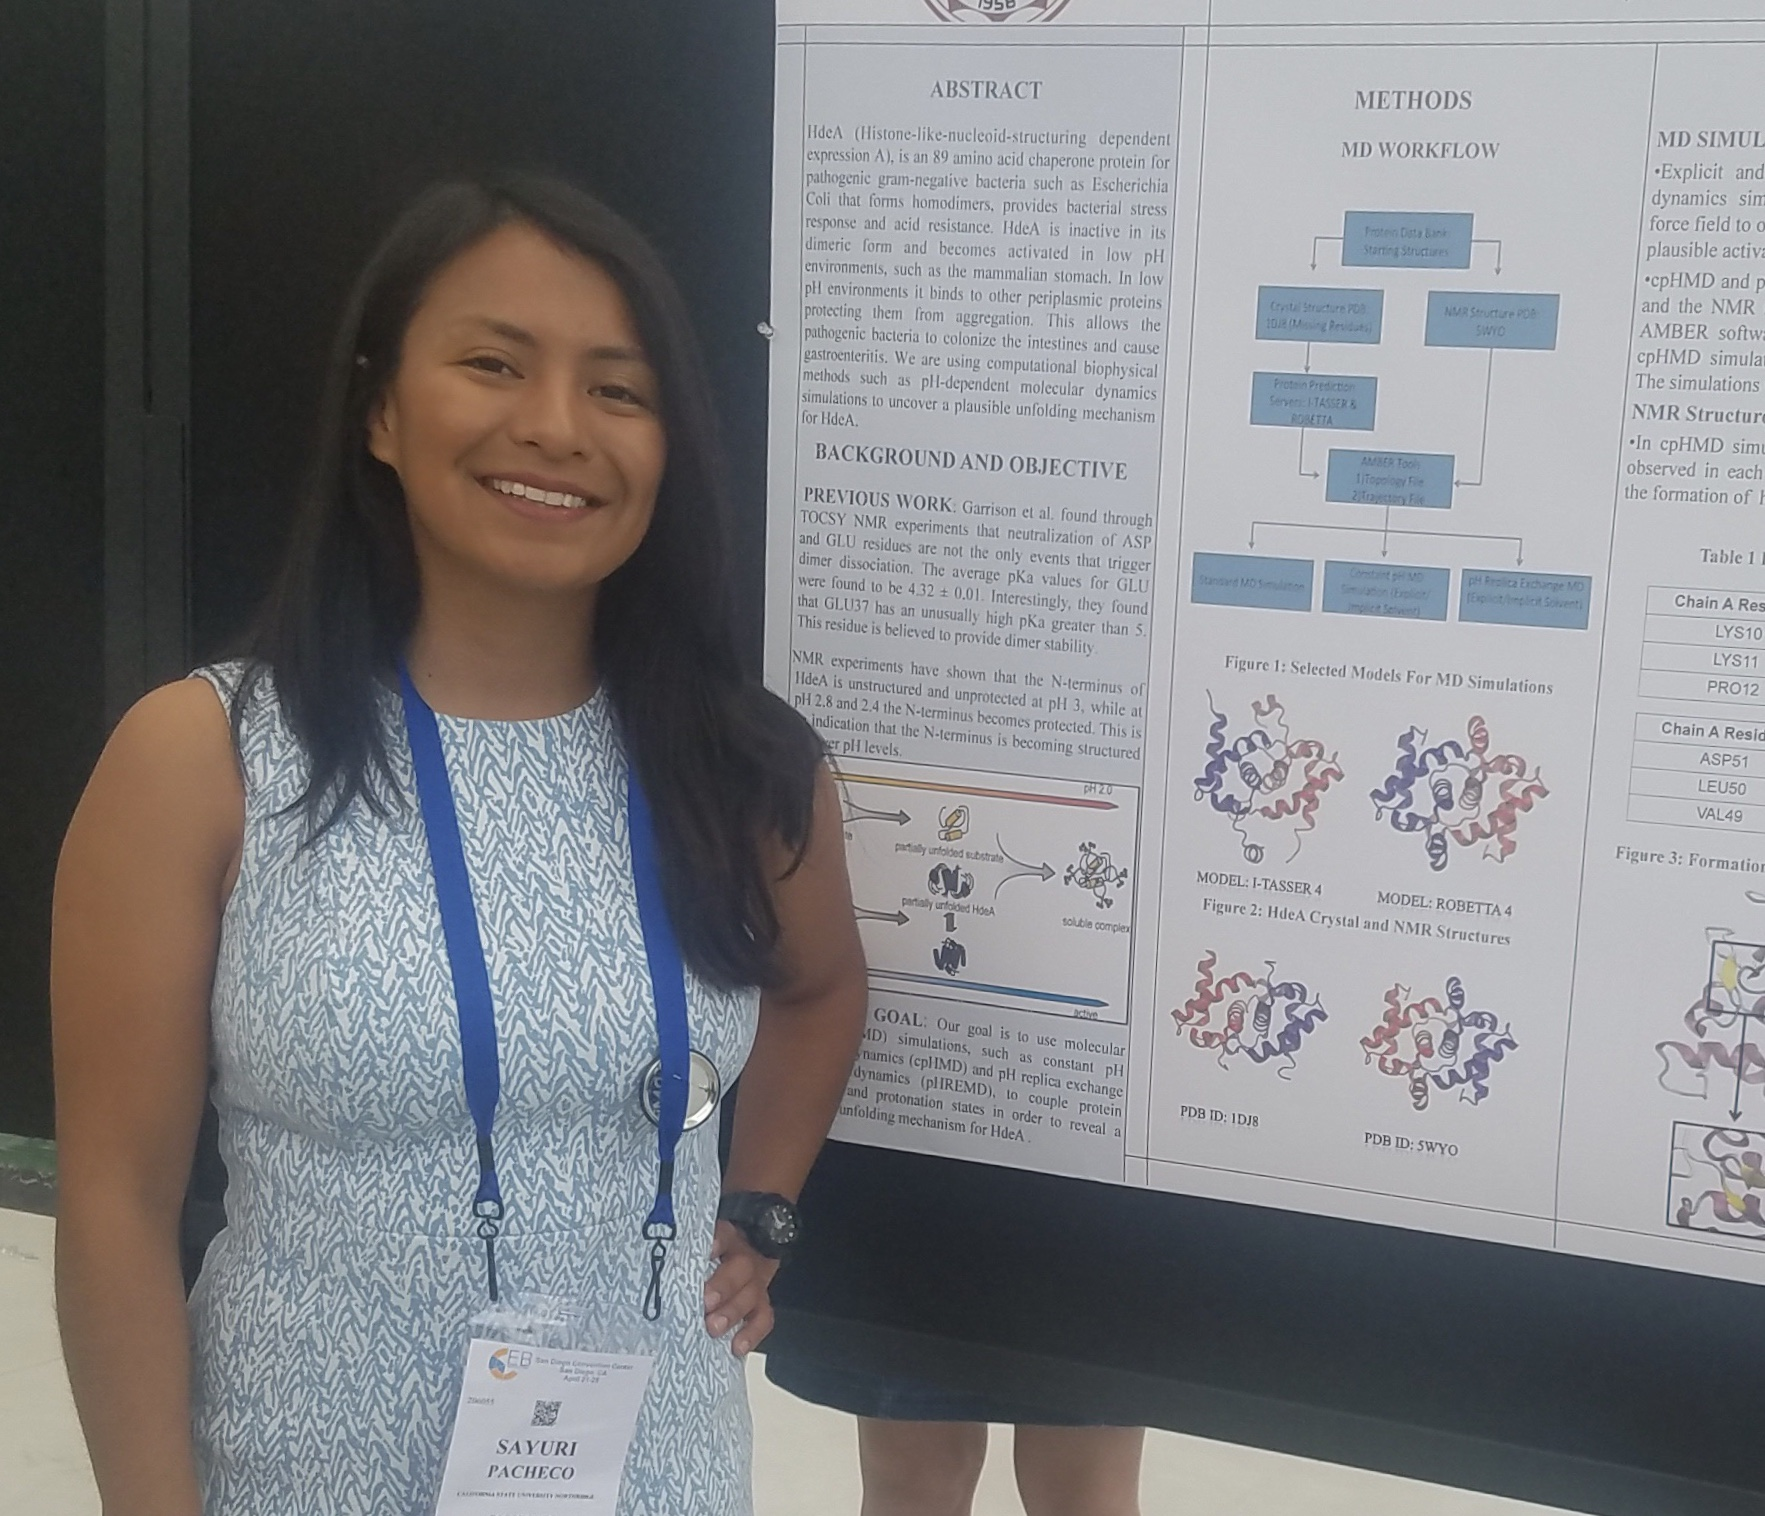 Sayuri Pacheco : Visiting Research Scholar